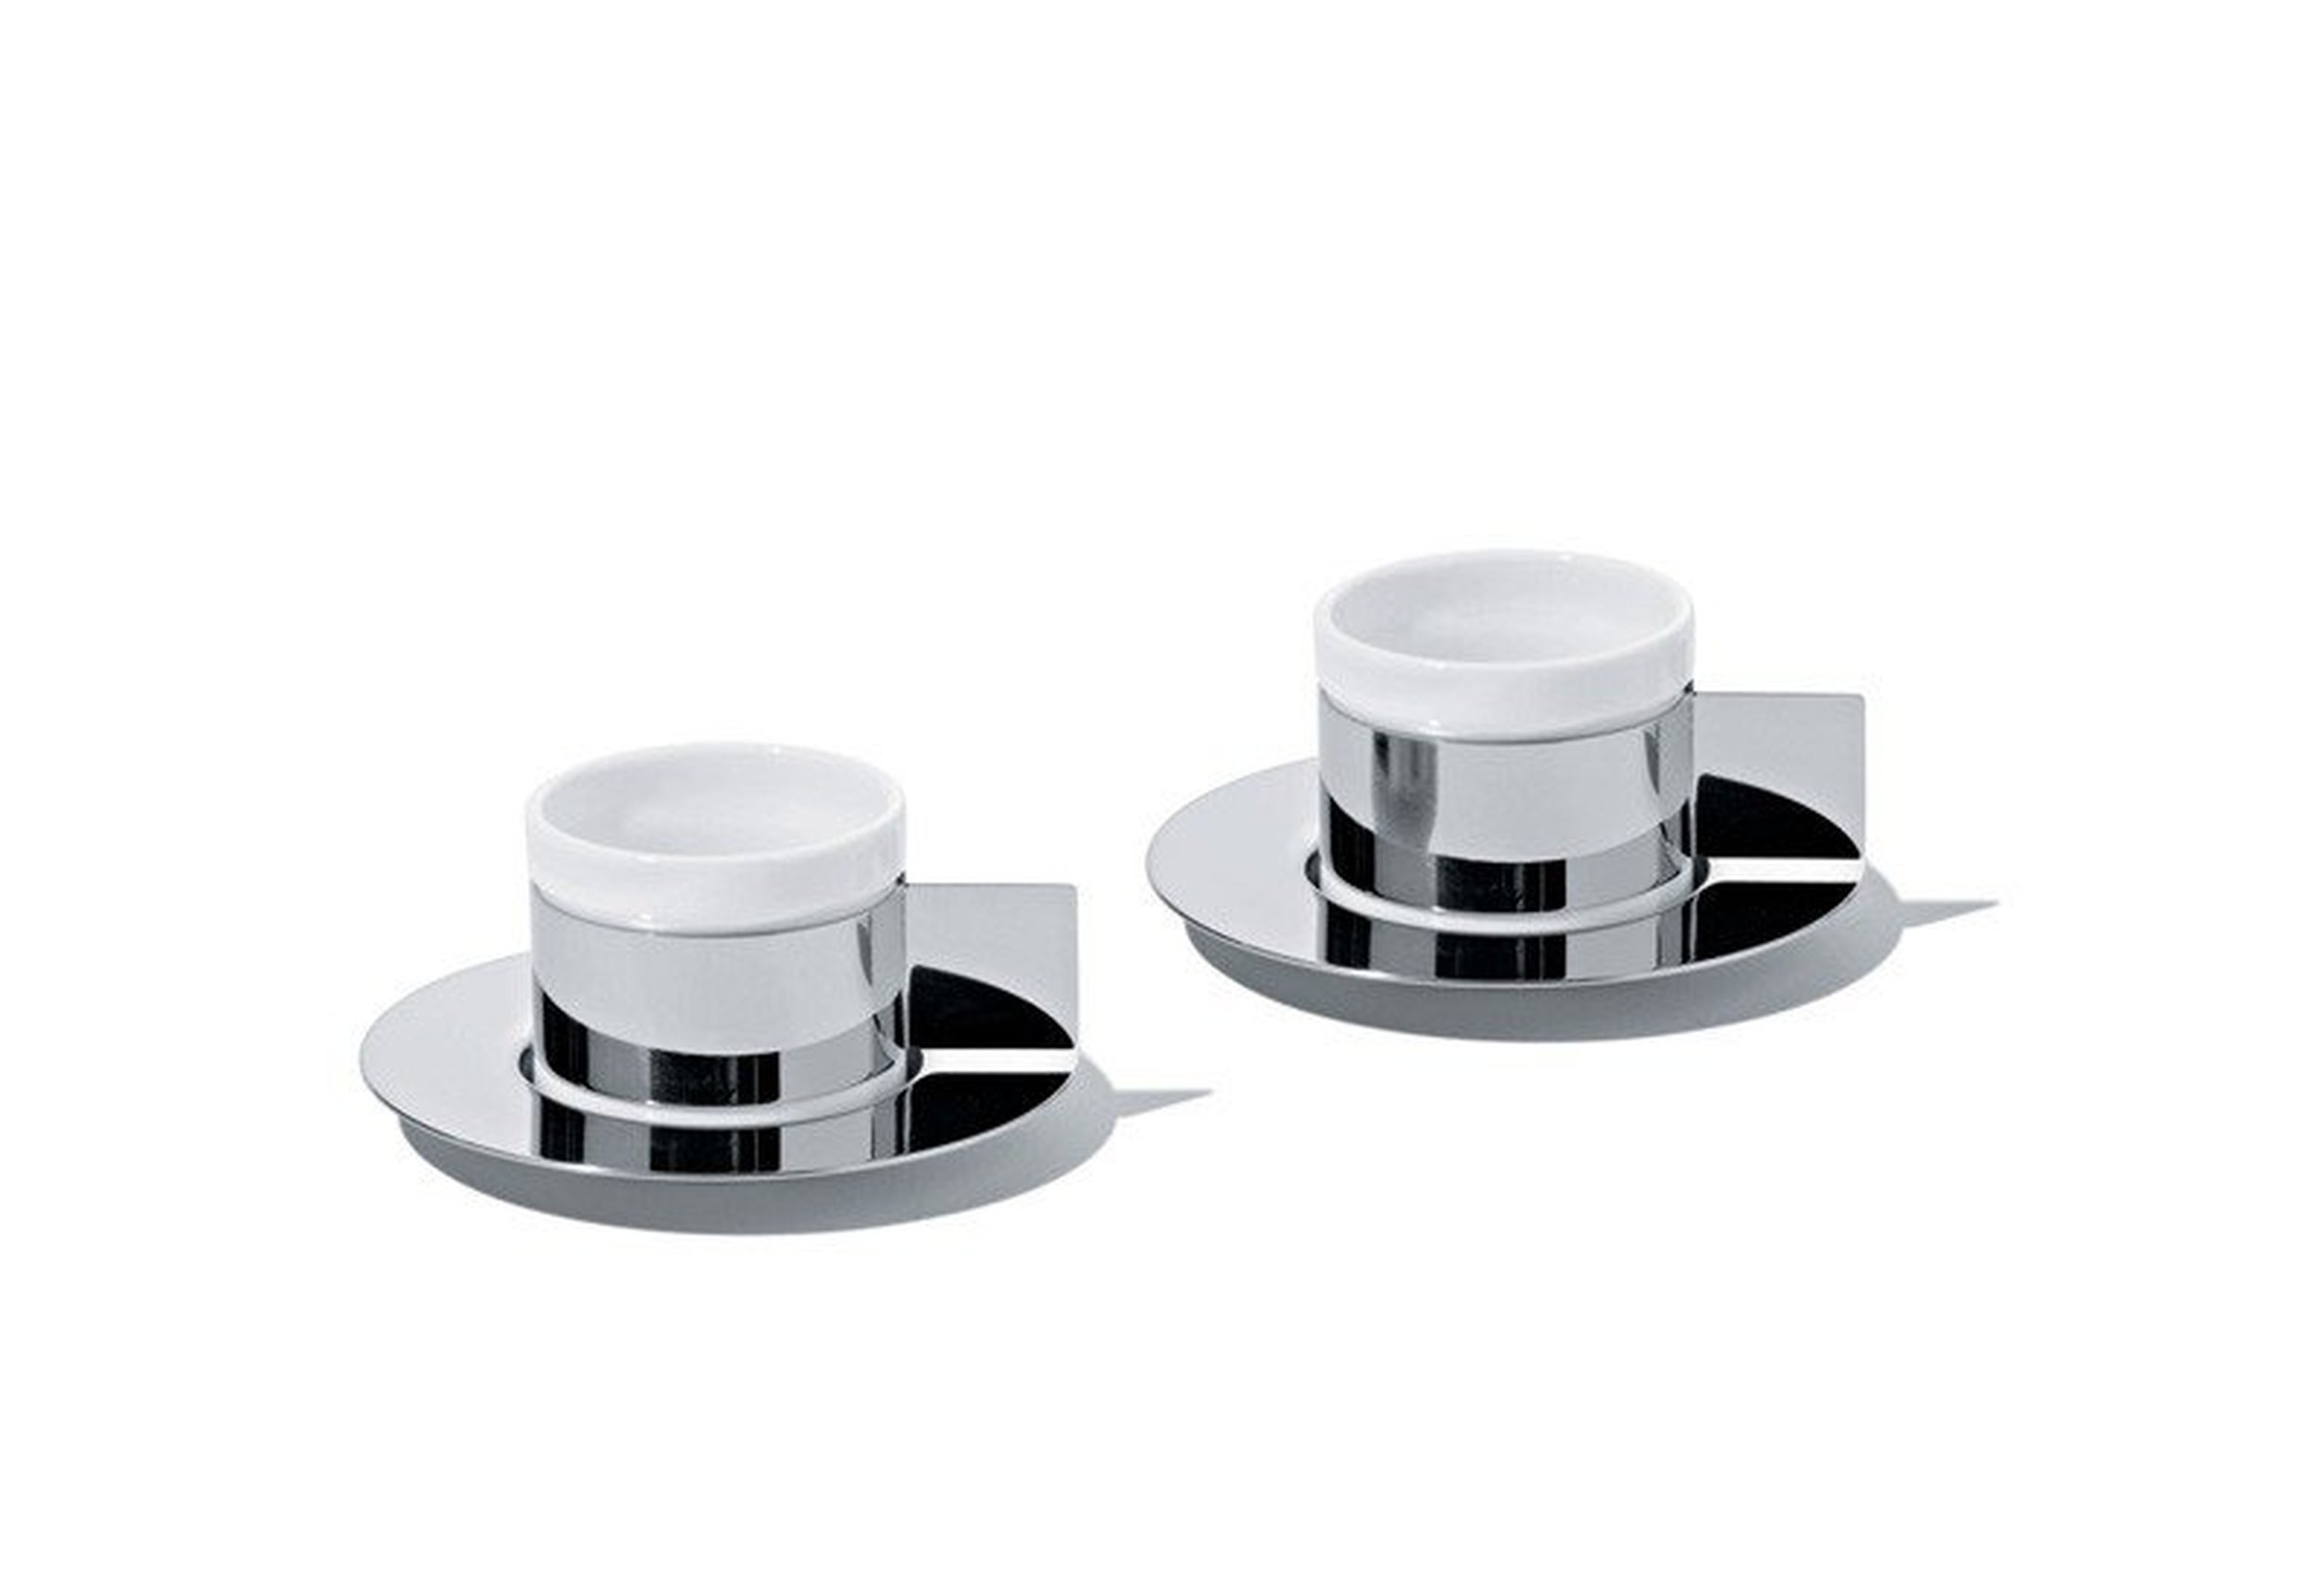 pin officina alessi espressokocher la conica design aldo. Black Bedroom Furniture Sets. Home Design Ideas